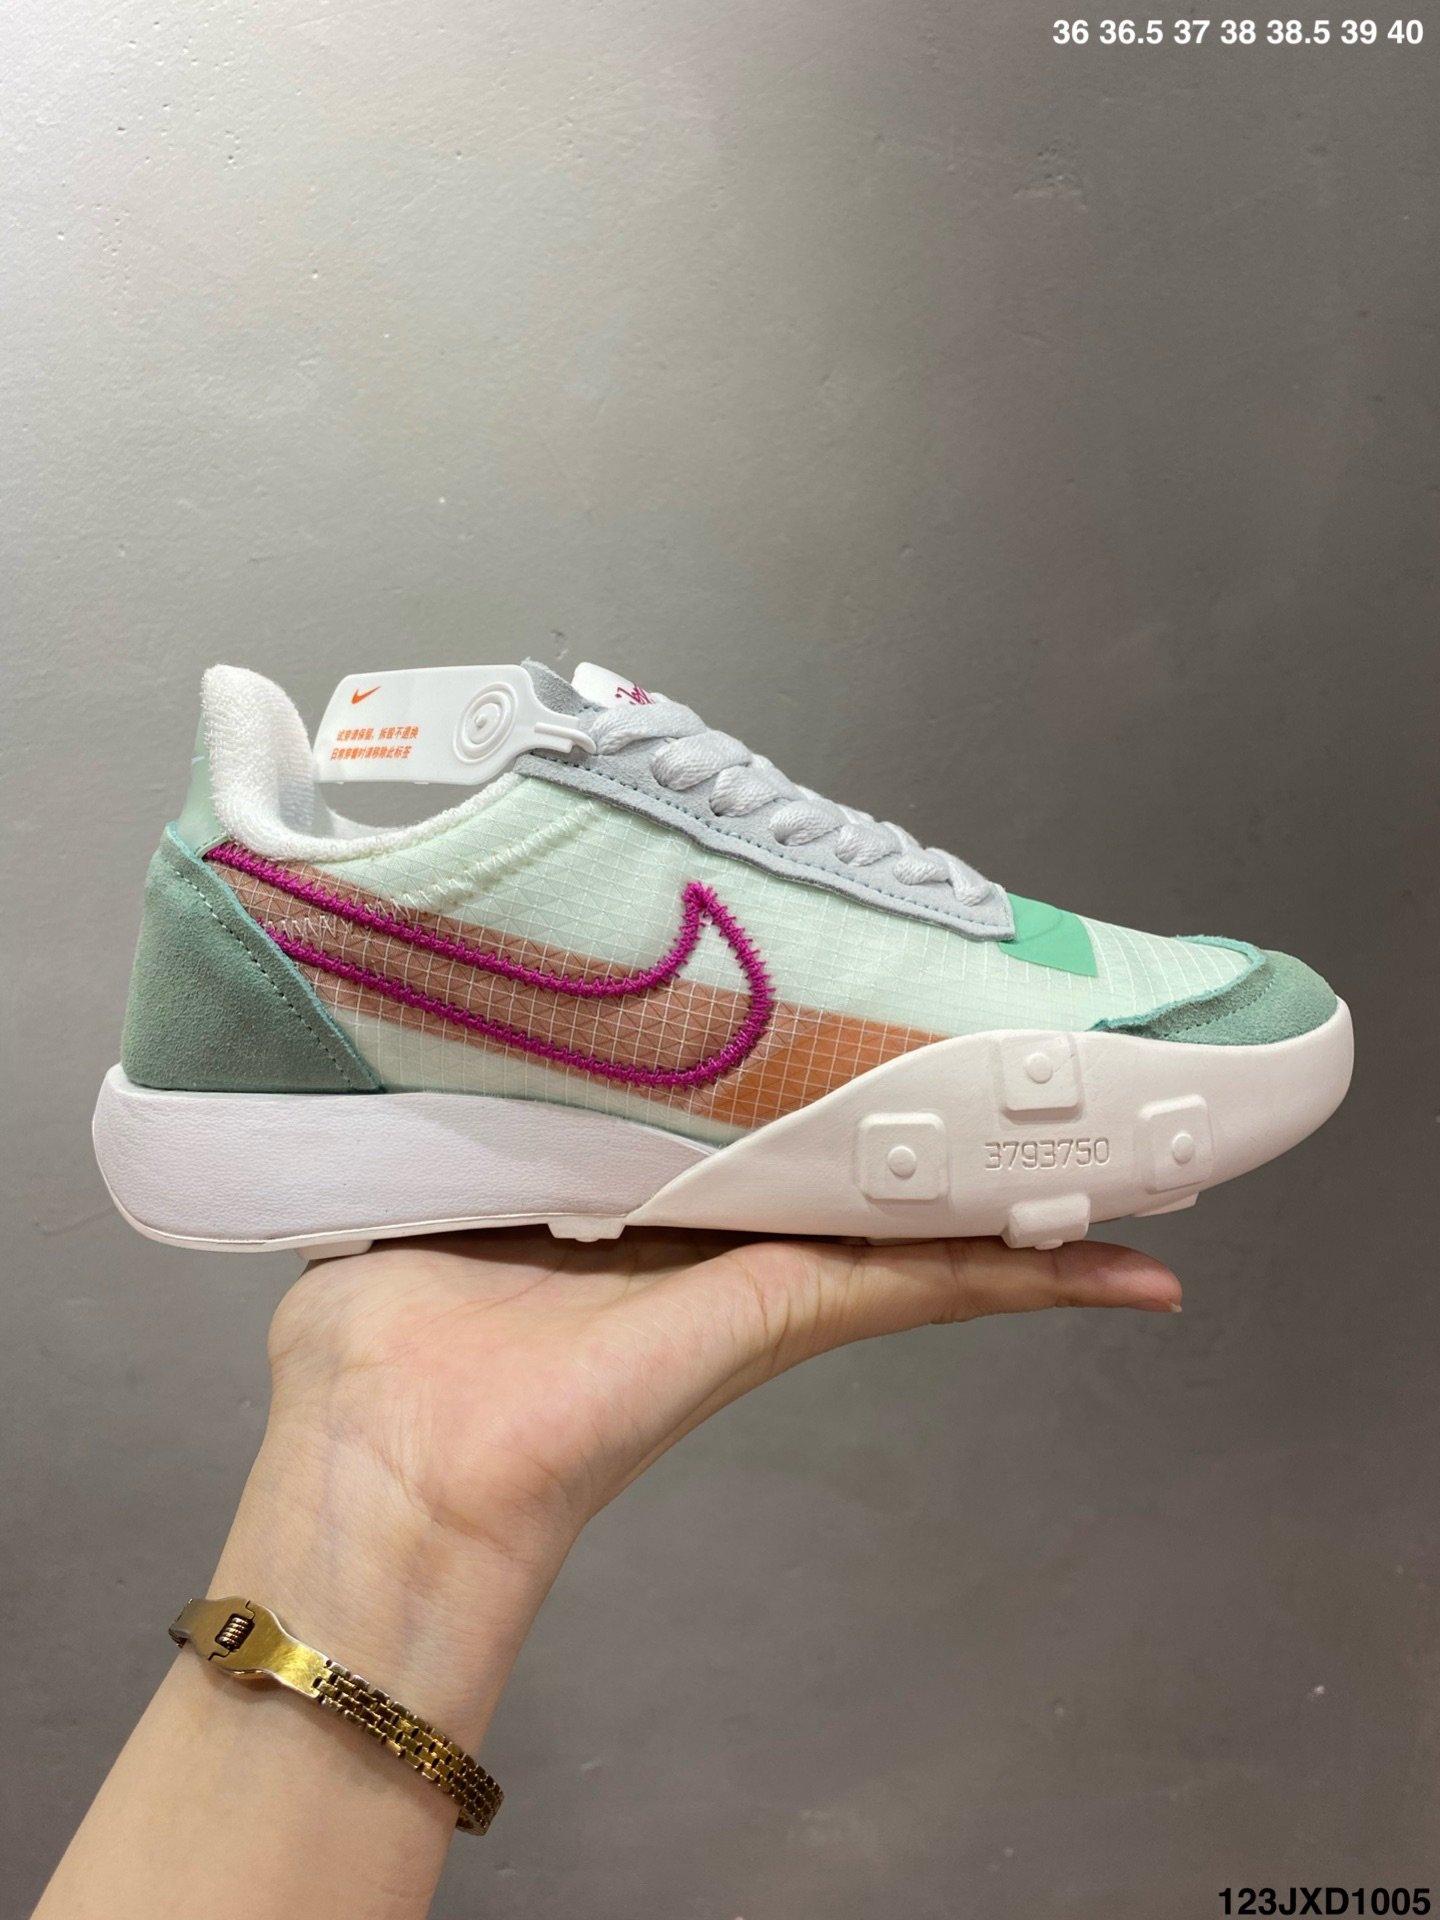 05104717957 - 运动鞋, 跑步鞋, Swoosh, Racer, Nike Waffle Racer 2X